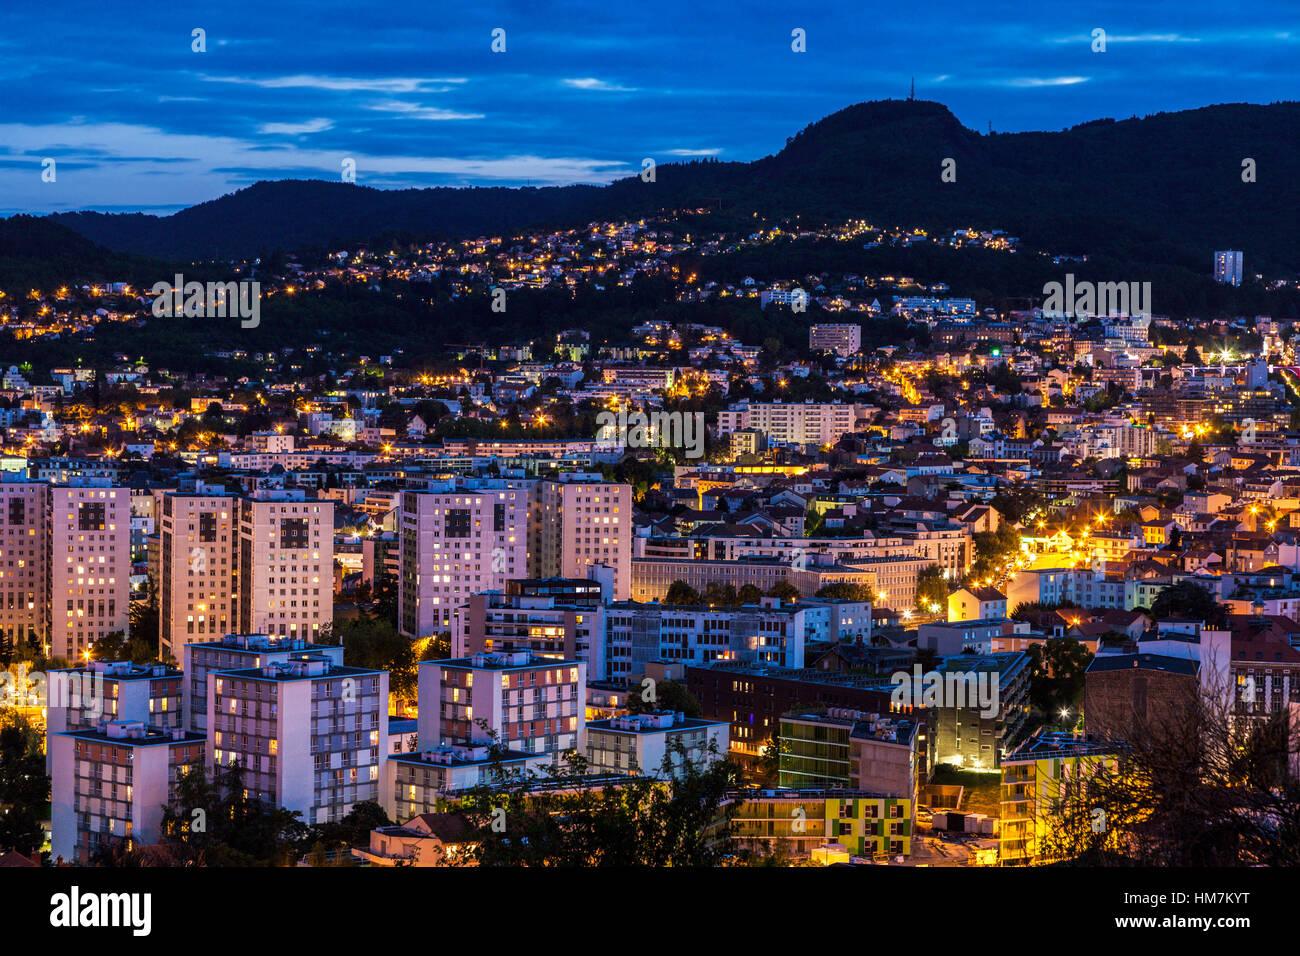 France, Auvergne-Rhone-Alpes, Clermont-Ferrand, Cityscape at dusk - Stock Image